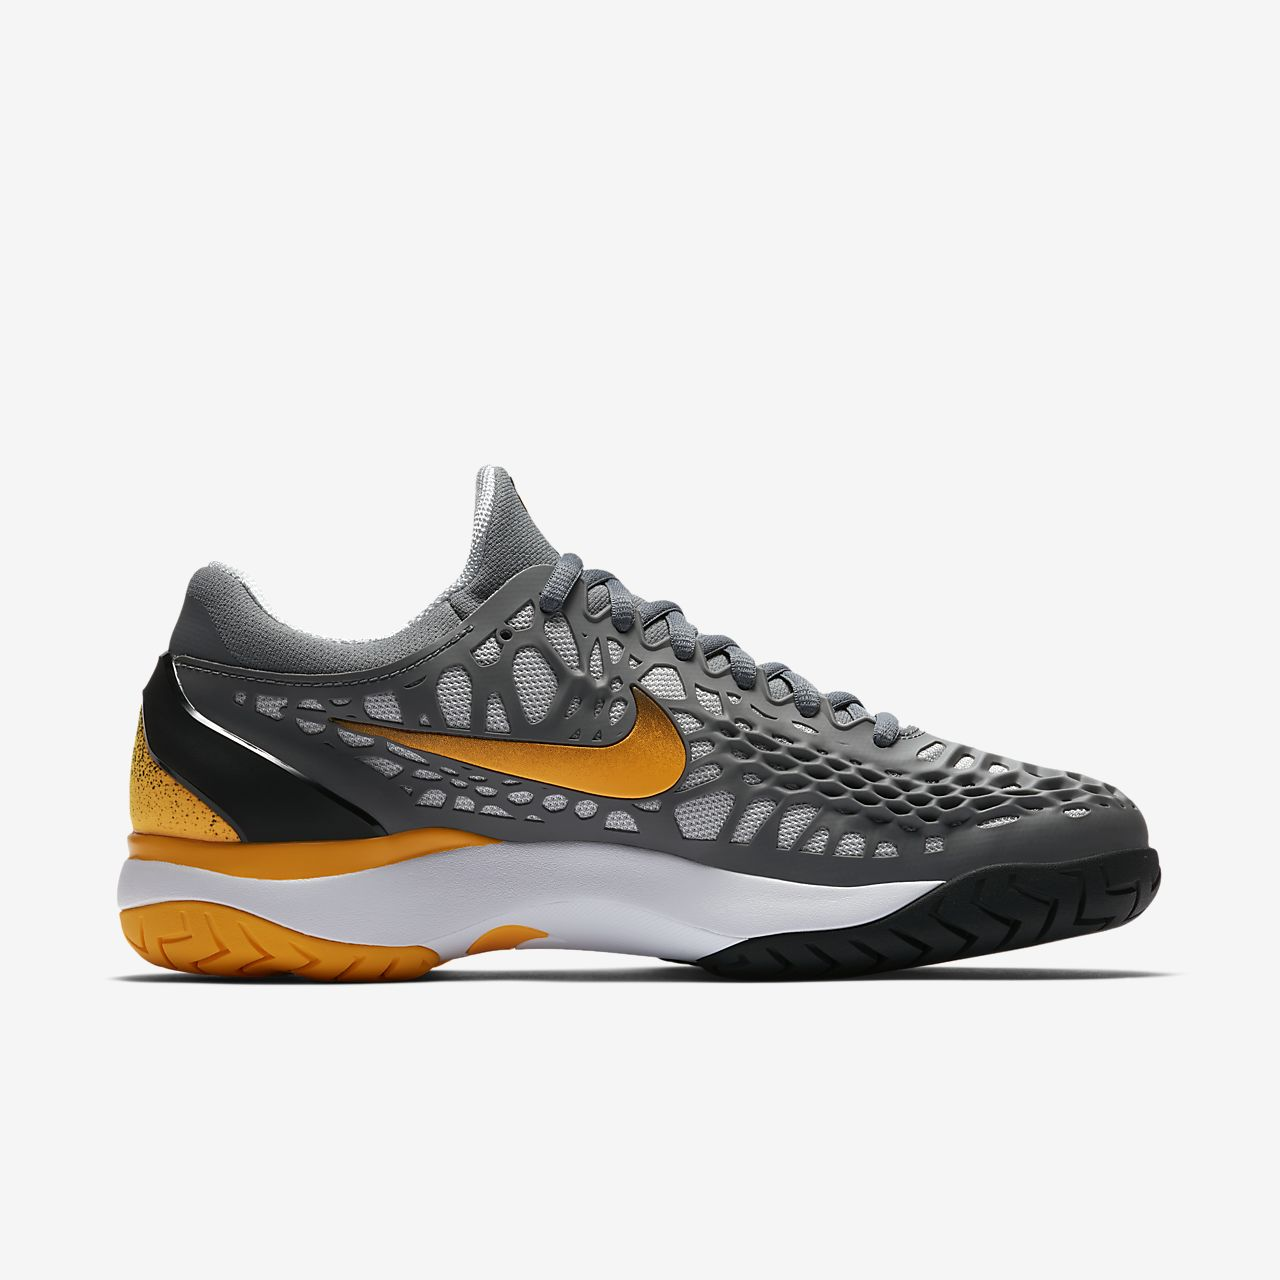 on sale 7e09c e256a ... Nike Zoom Cage 3 HC Men s Tennis Shoe